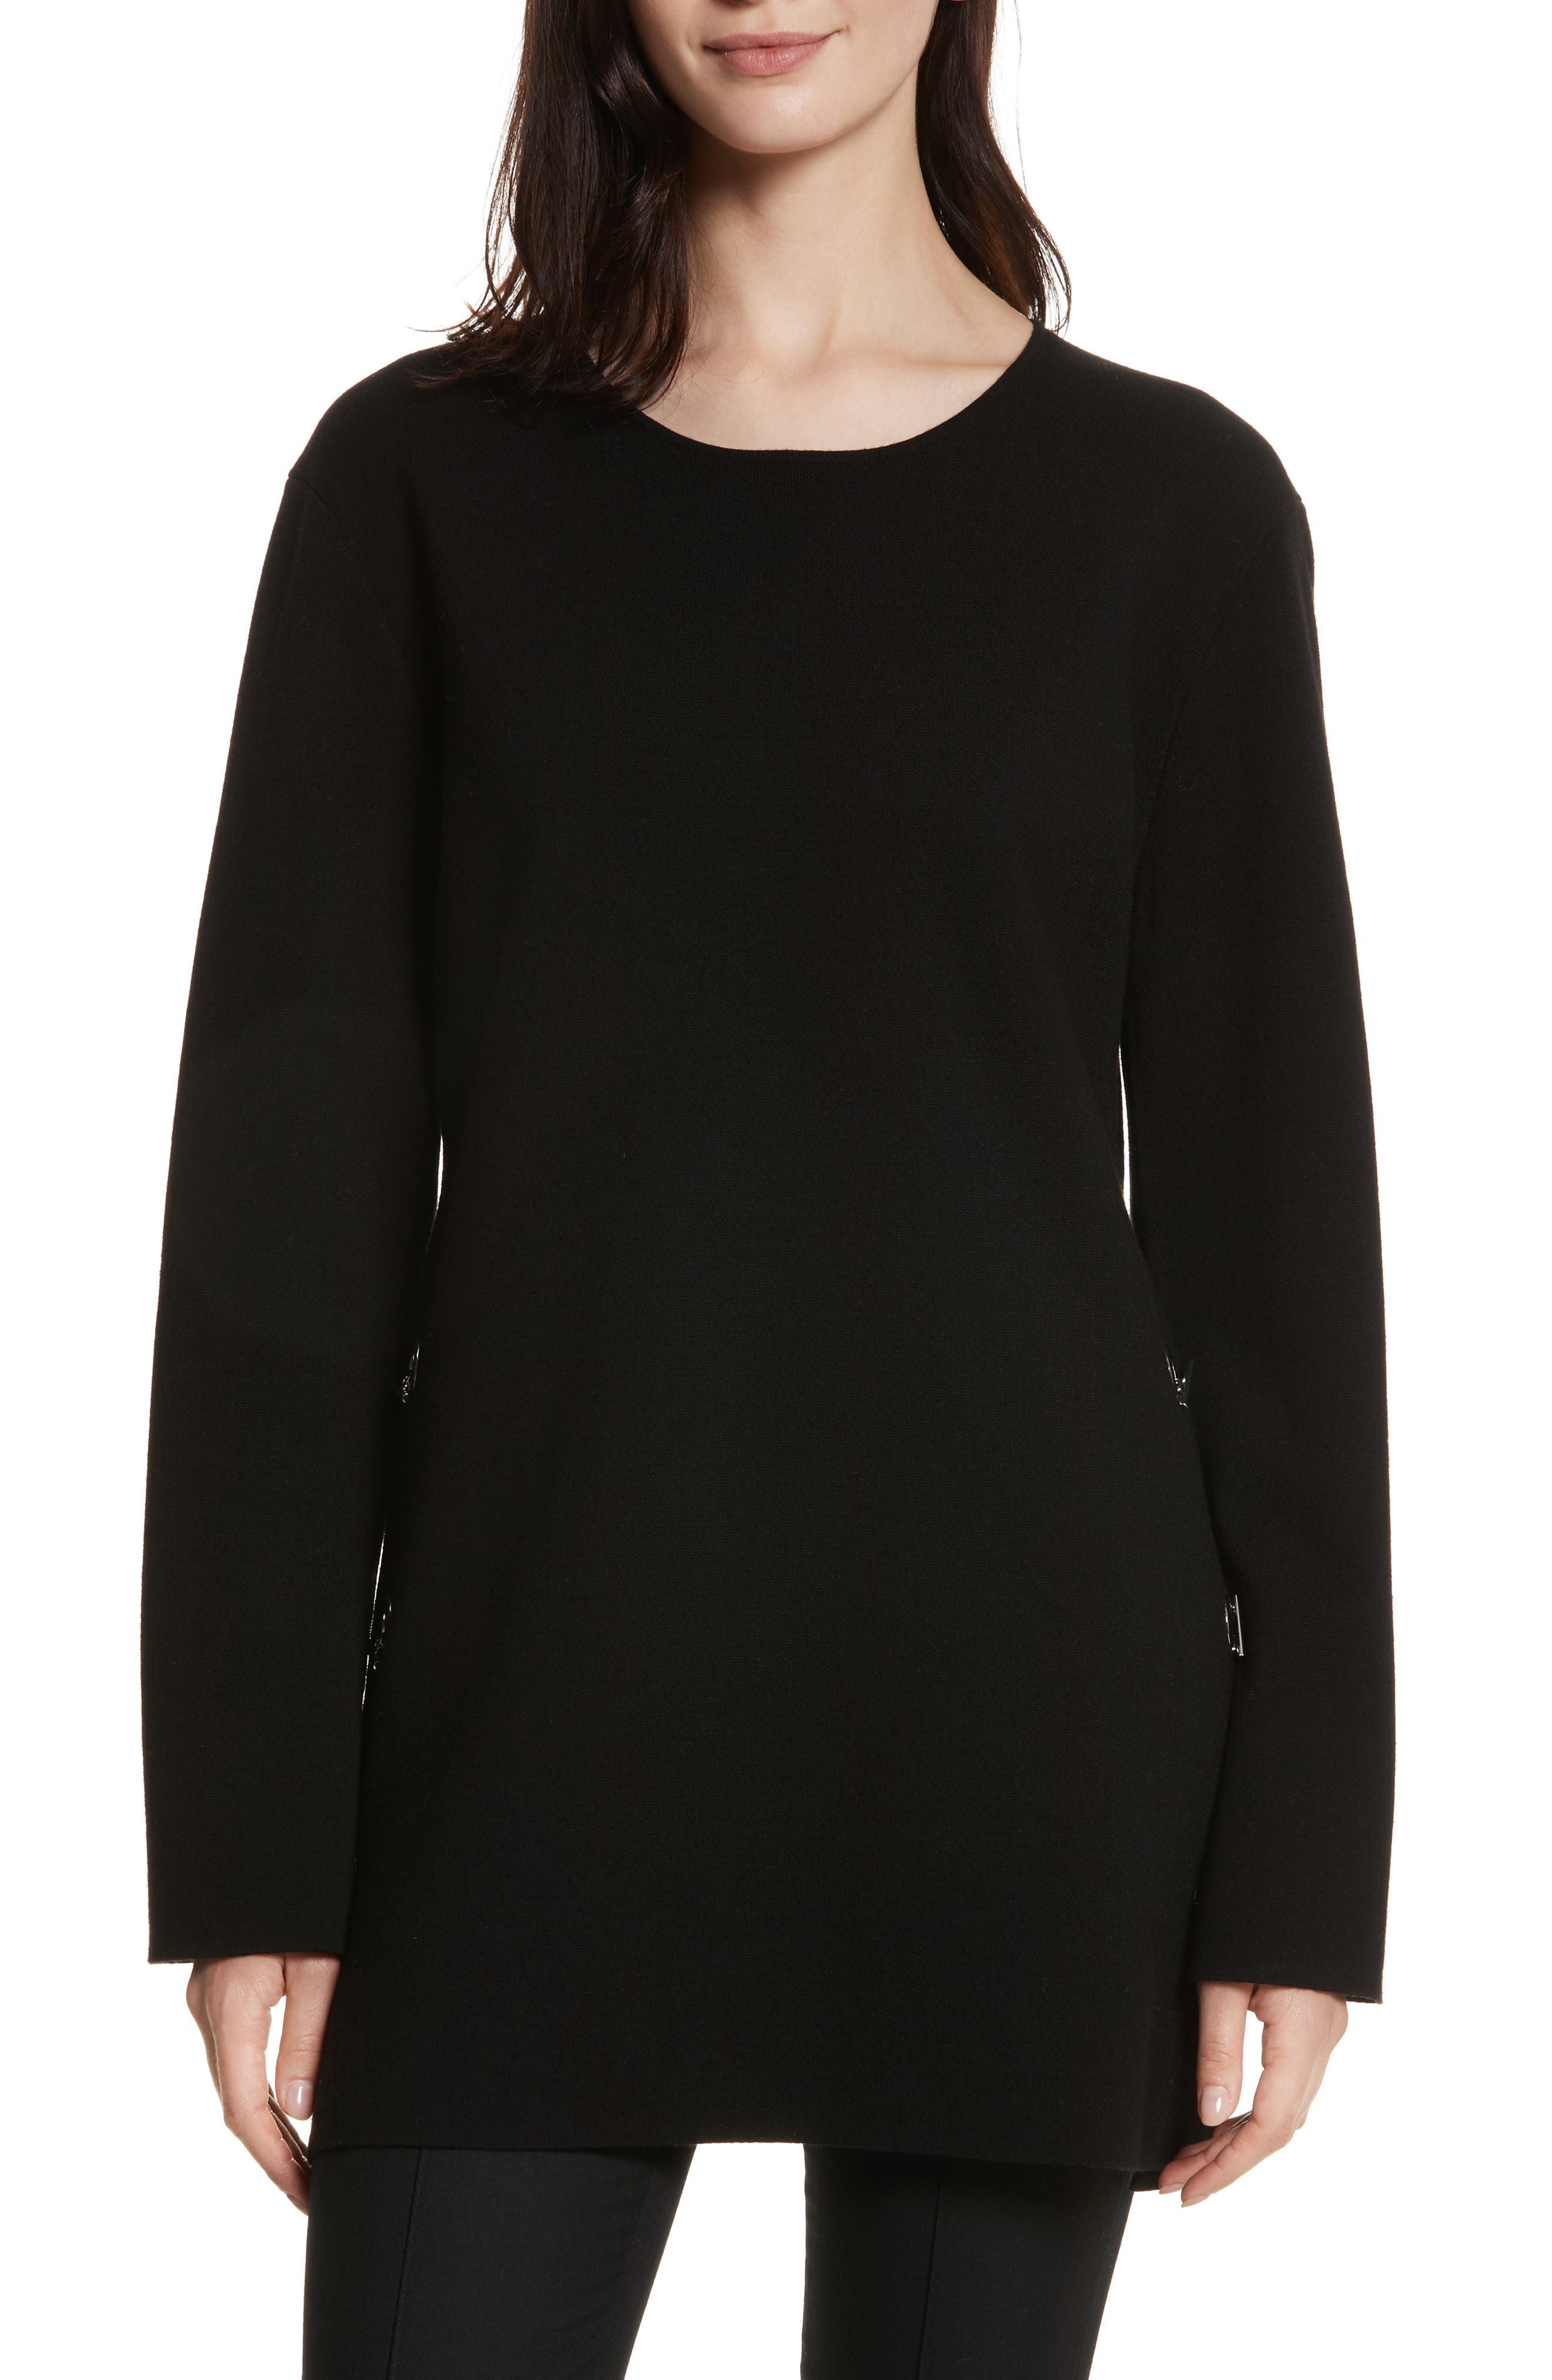 Main Image - Elizabeth and James Nola Grommet Tunic Sweater